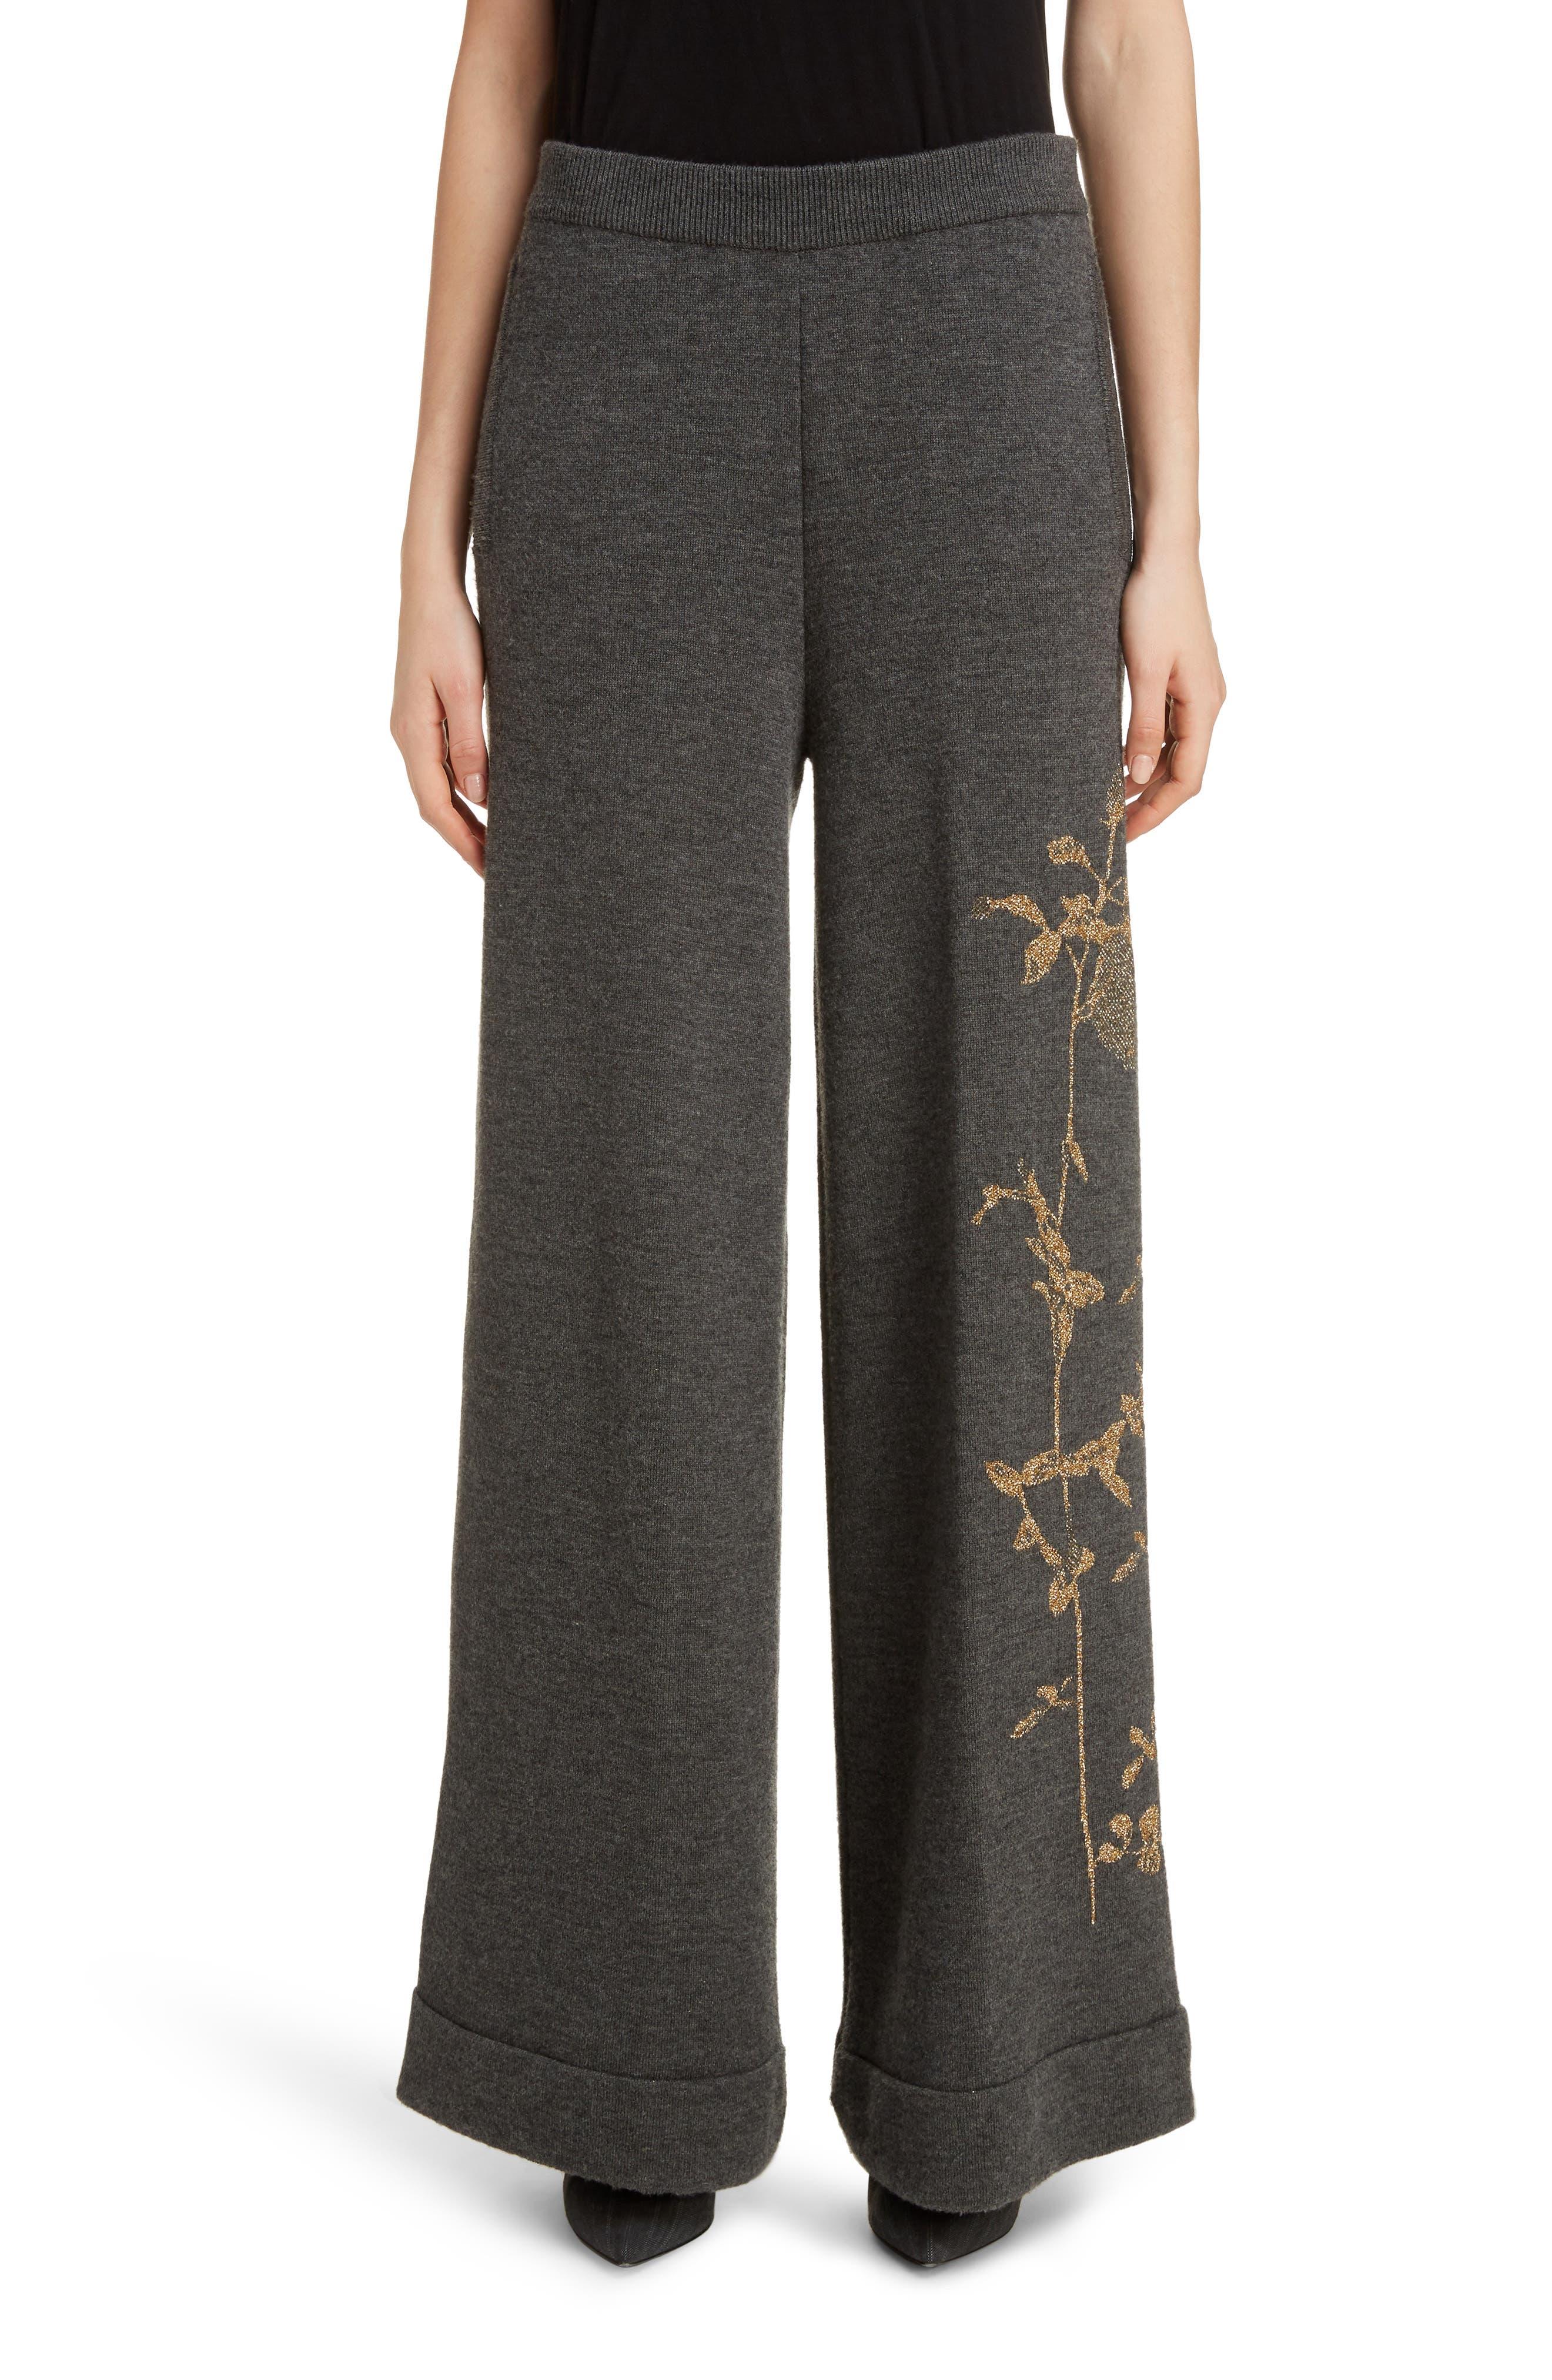 Dries Van Noten Pants Target Metallic Rose Merino Wool Blend Pants